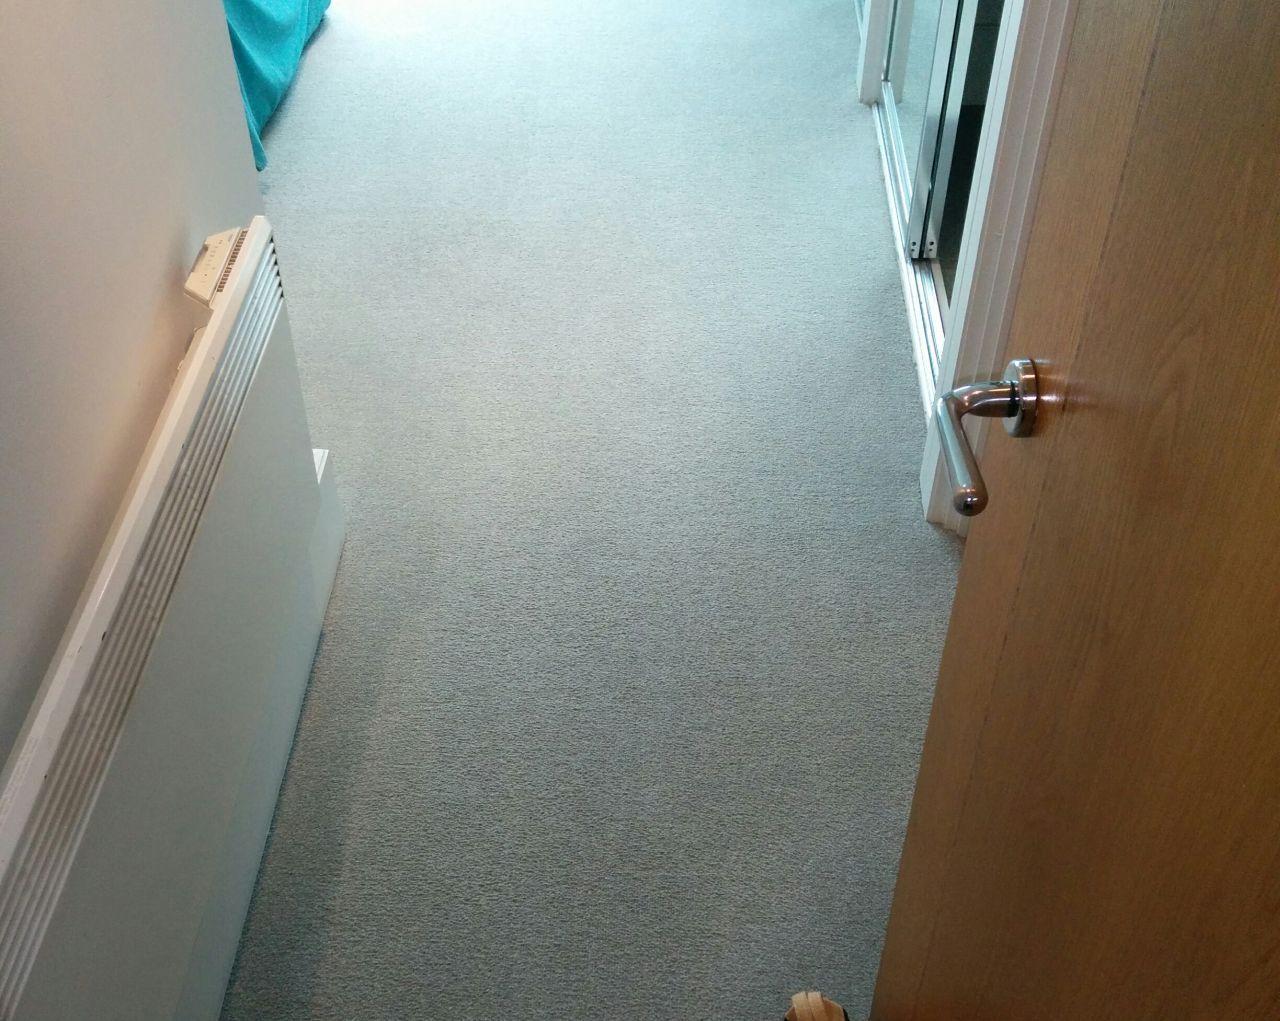 carpet cleaners South Kensington